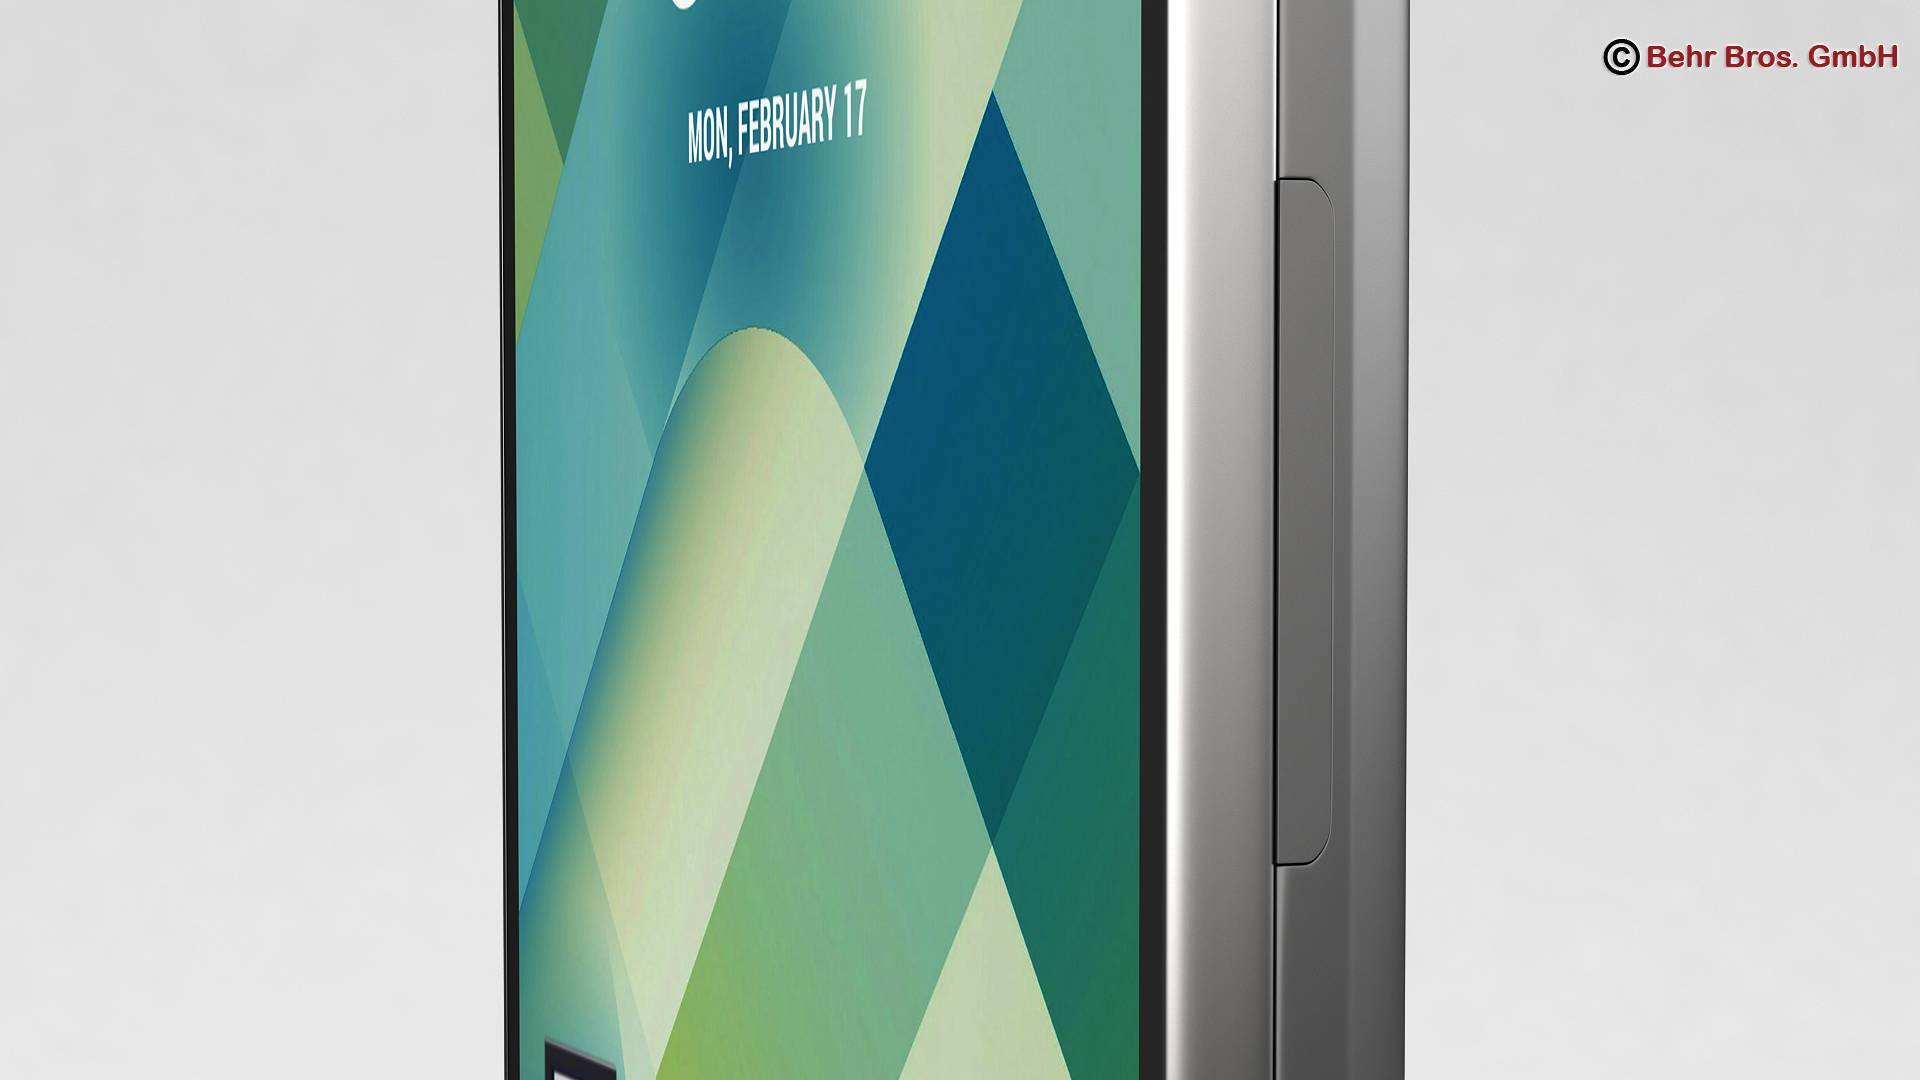 generic smartphone 5.2 inch 3d model 3ds max fbx c4d lwo ma mb obj 161650